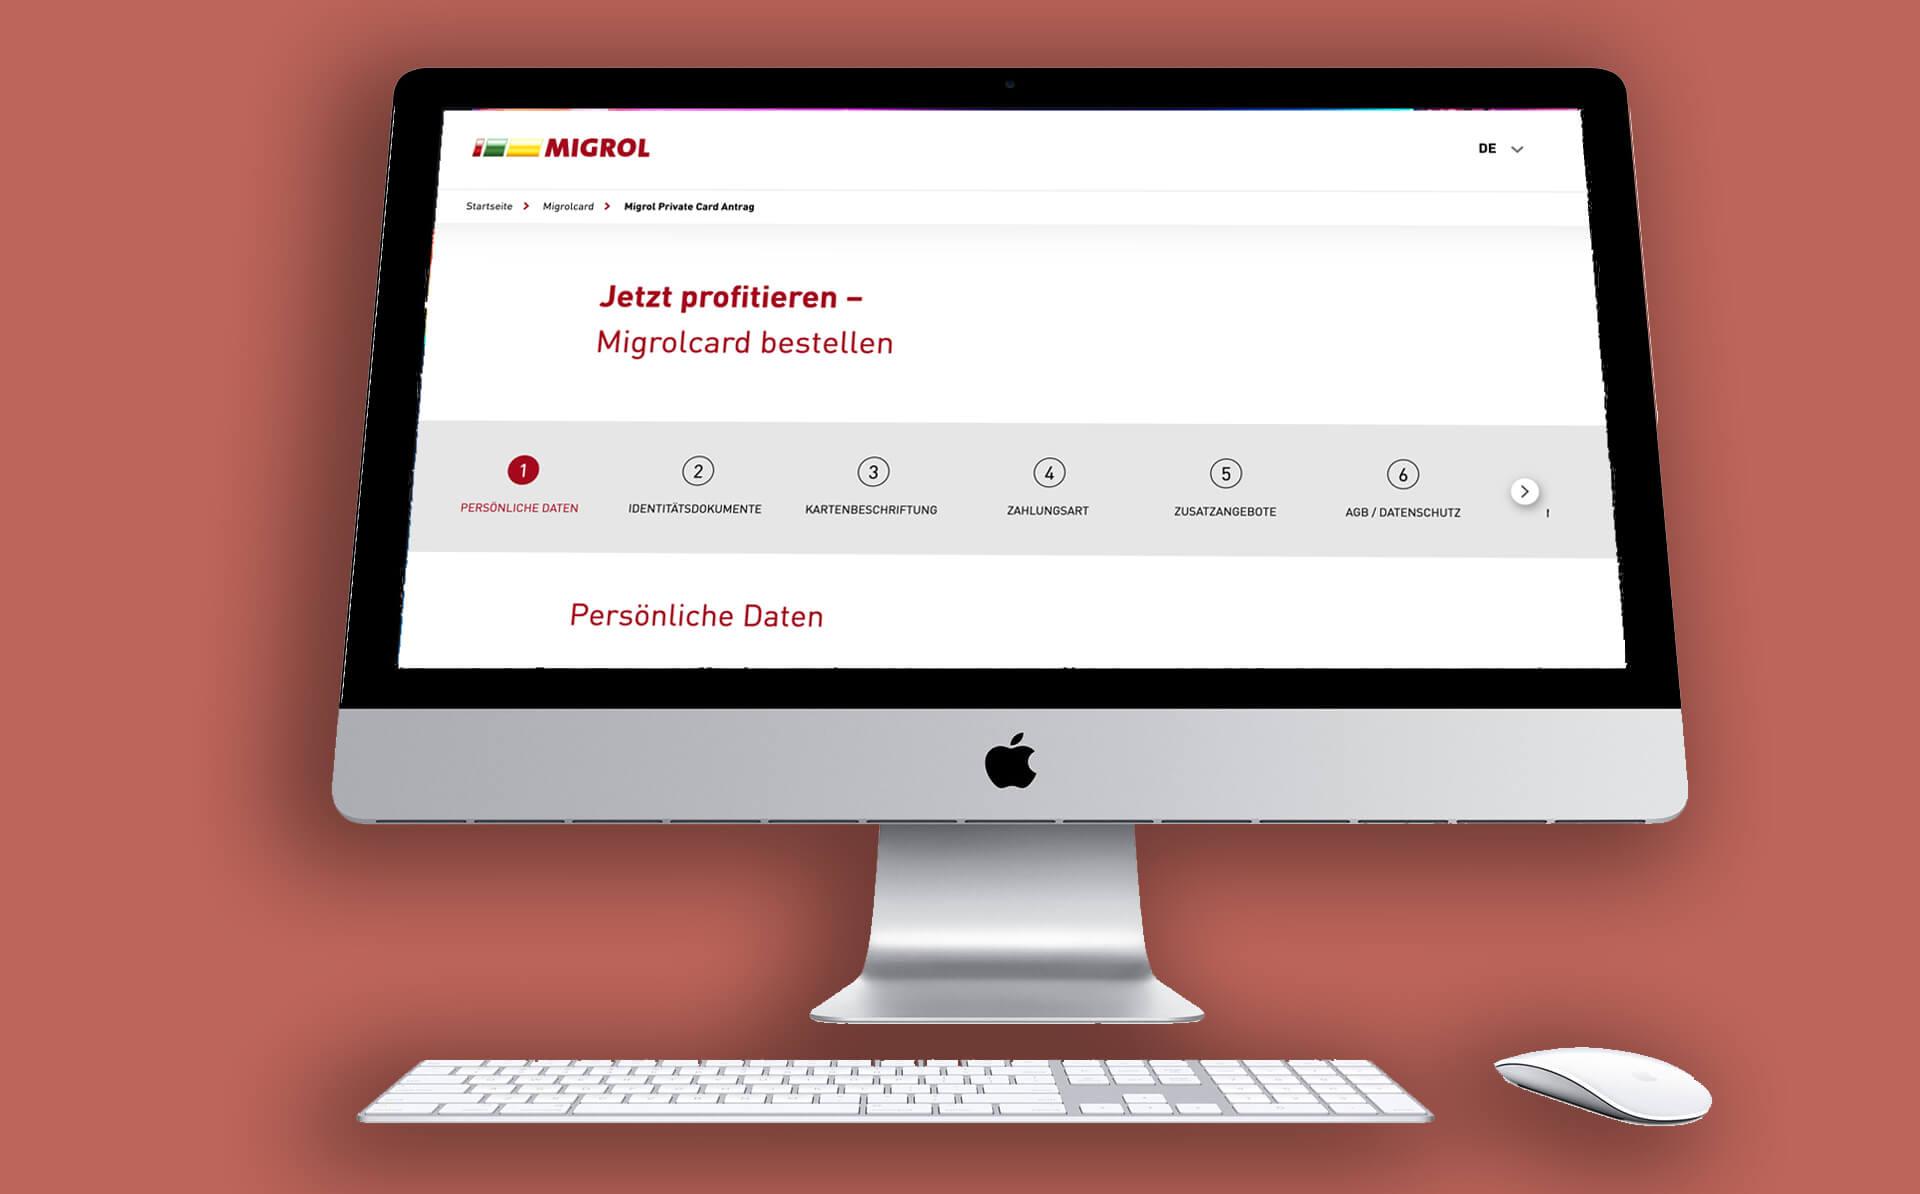 migrol-onboarding-app-and-portal